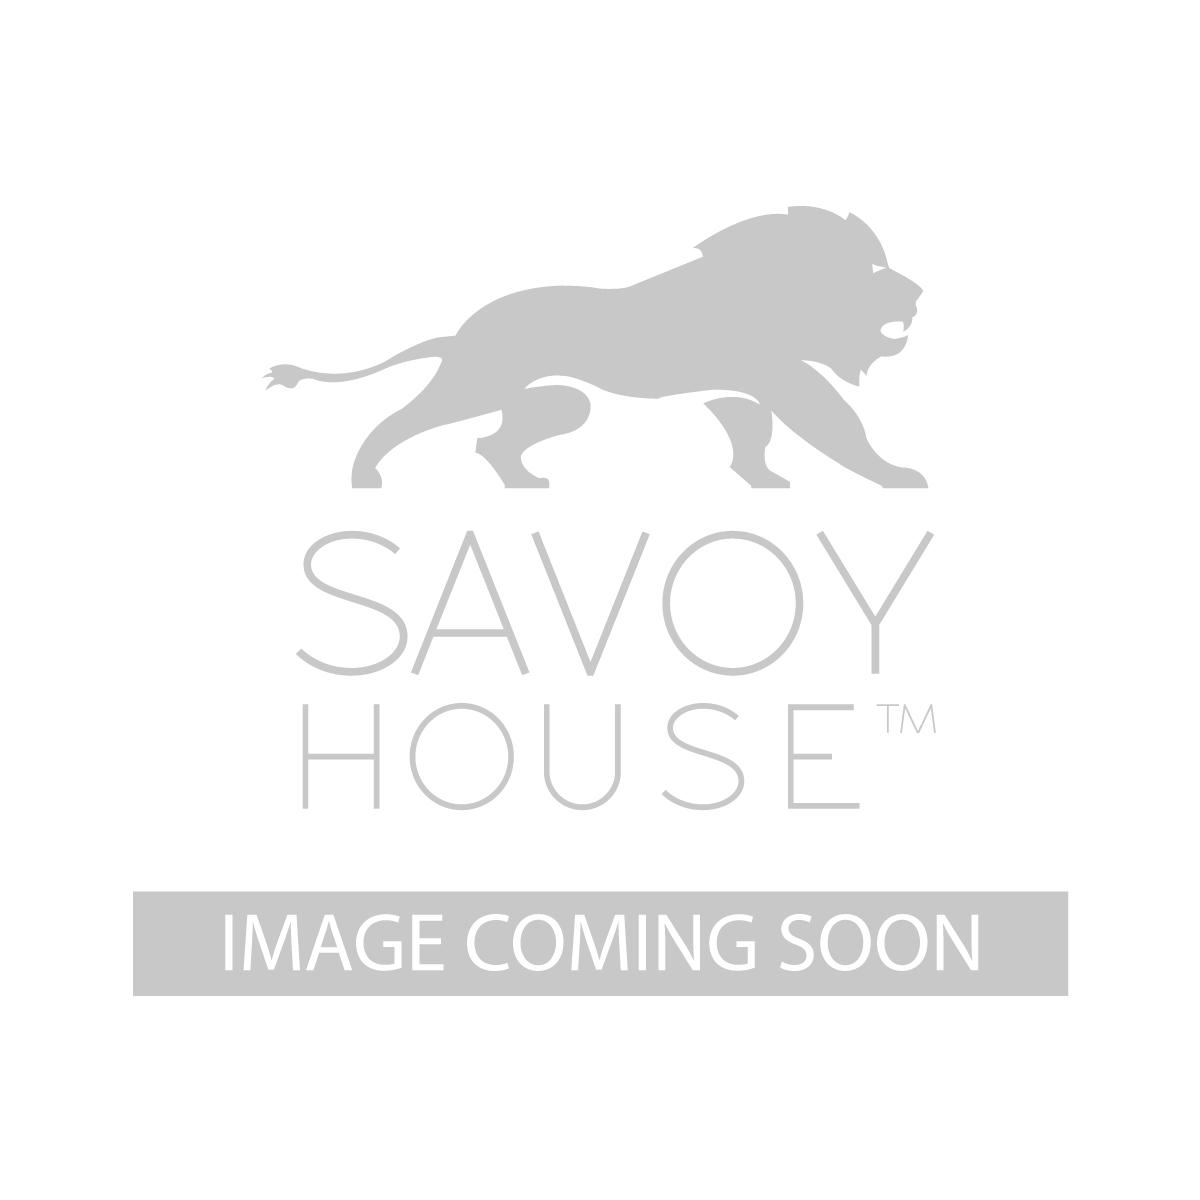 8 6836 4 13 melrose 4 light bath bar by savoy house duvall 4 light bath bar aloadofball Images